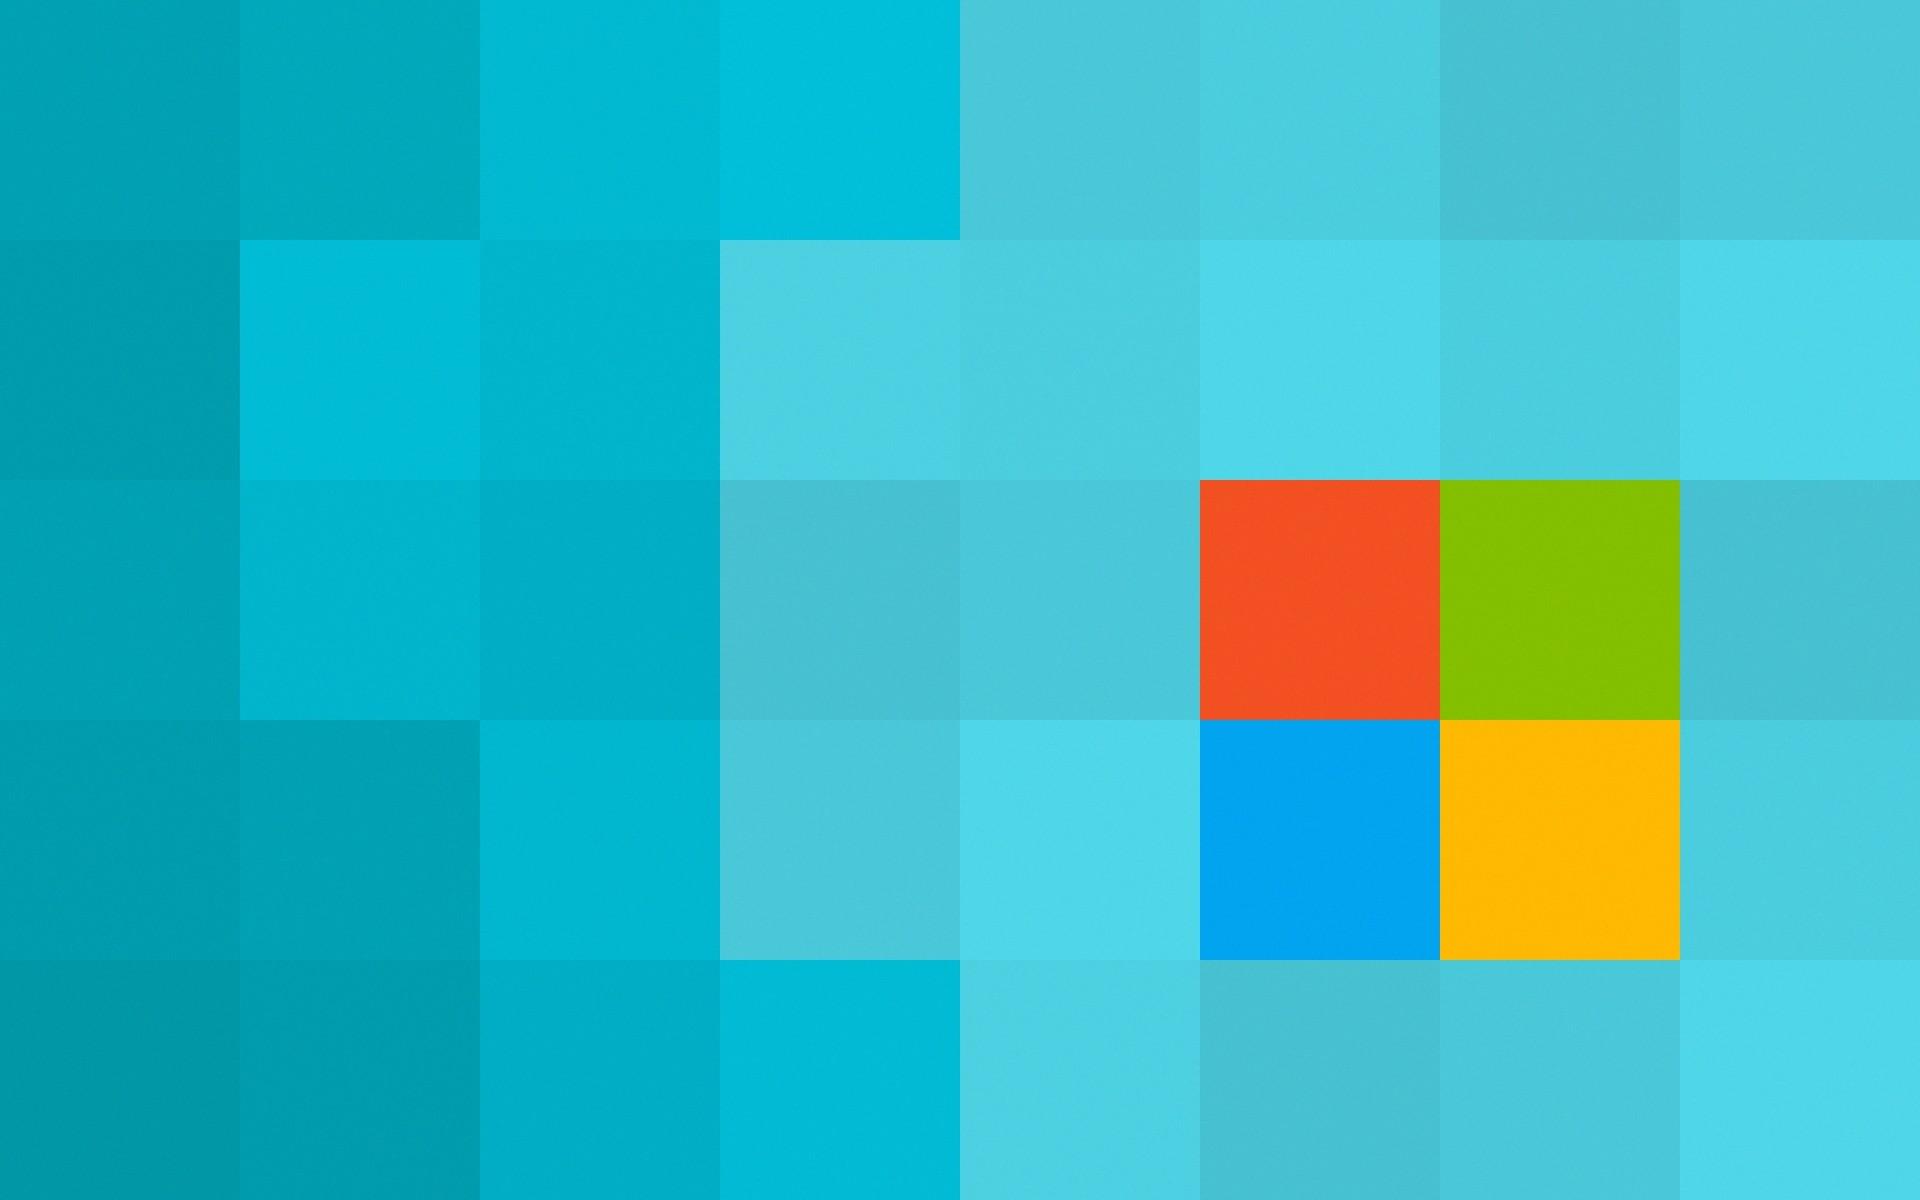 Windows 10 Minimal Phone Wallpapers